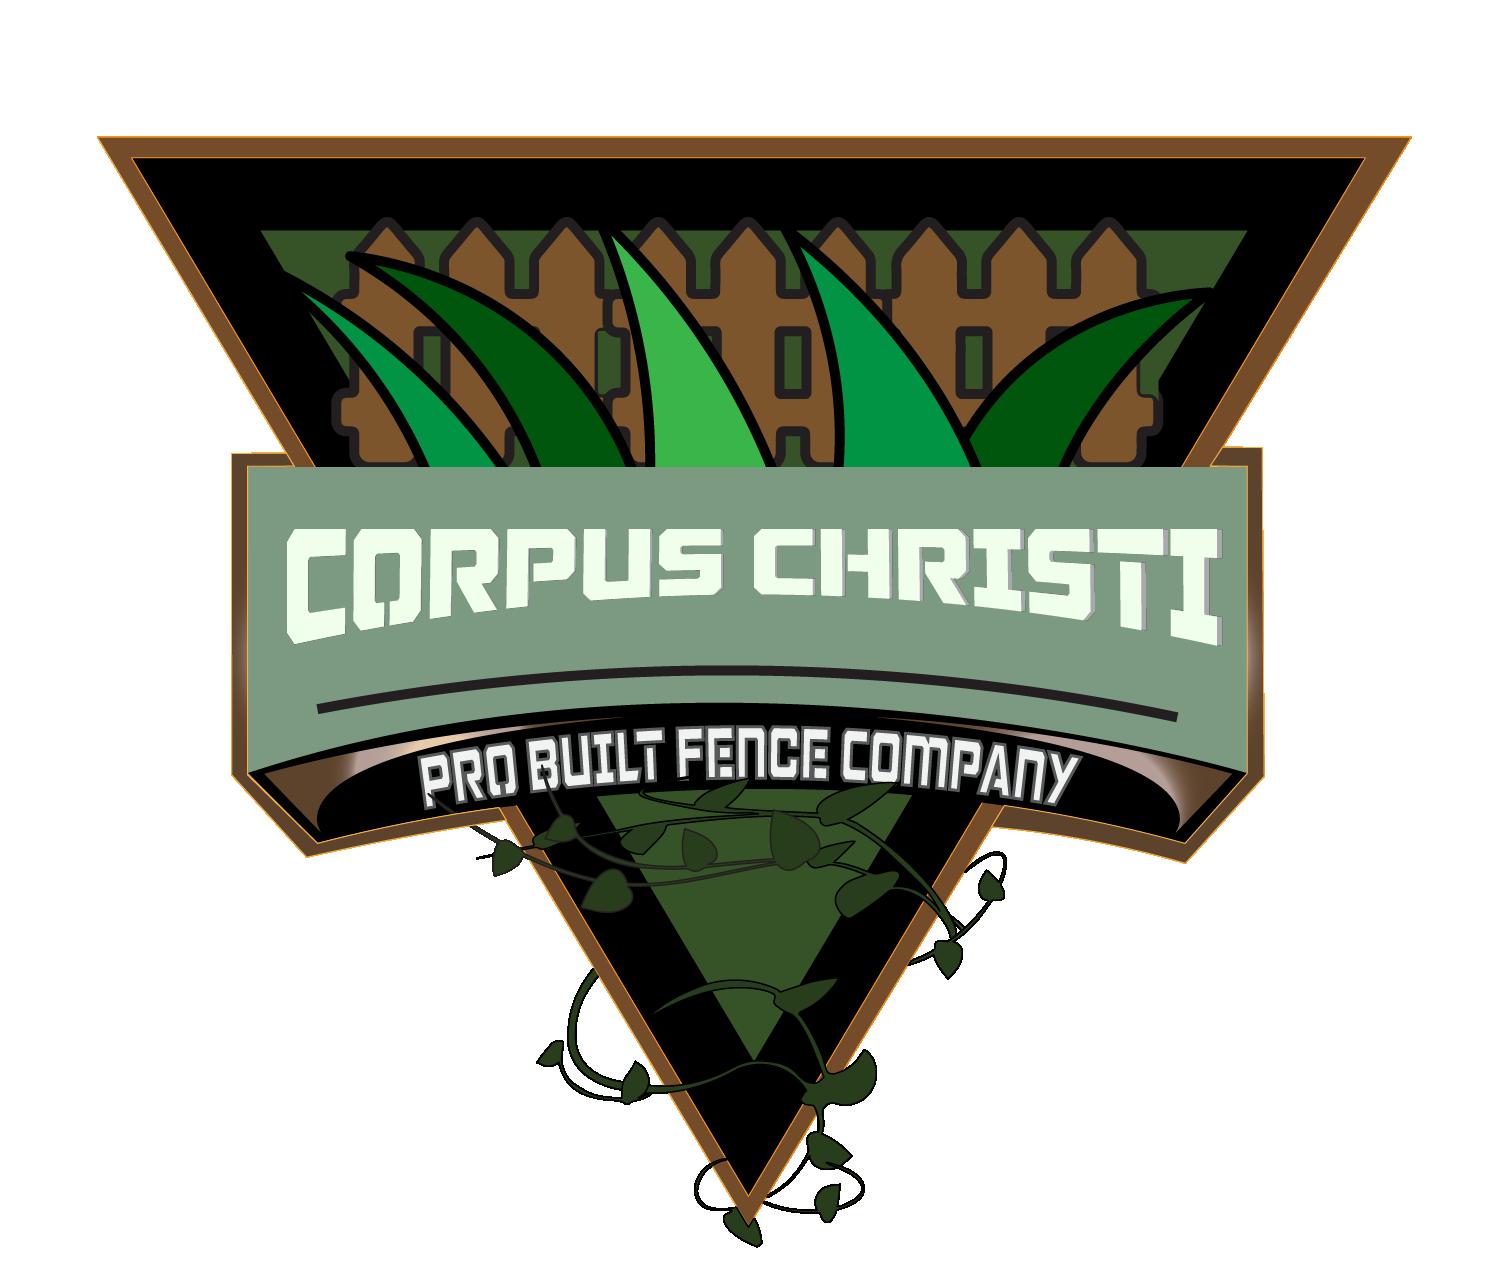 pro built corpus christi fence company